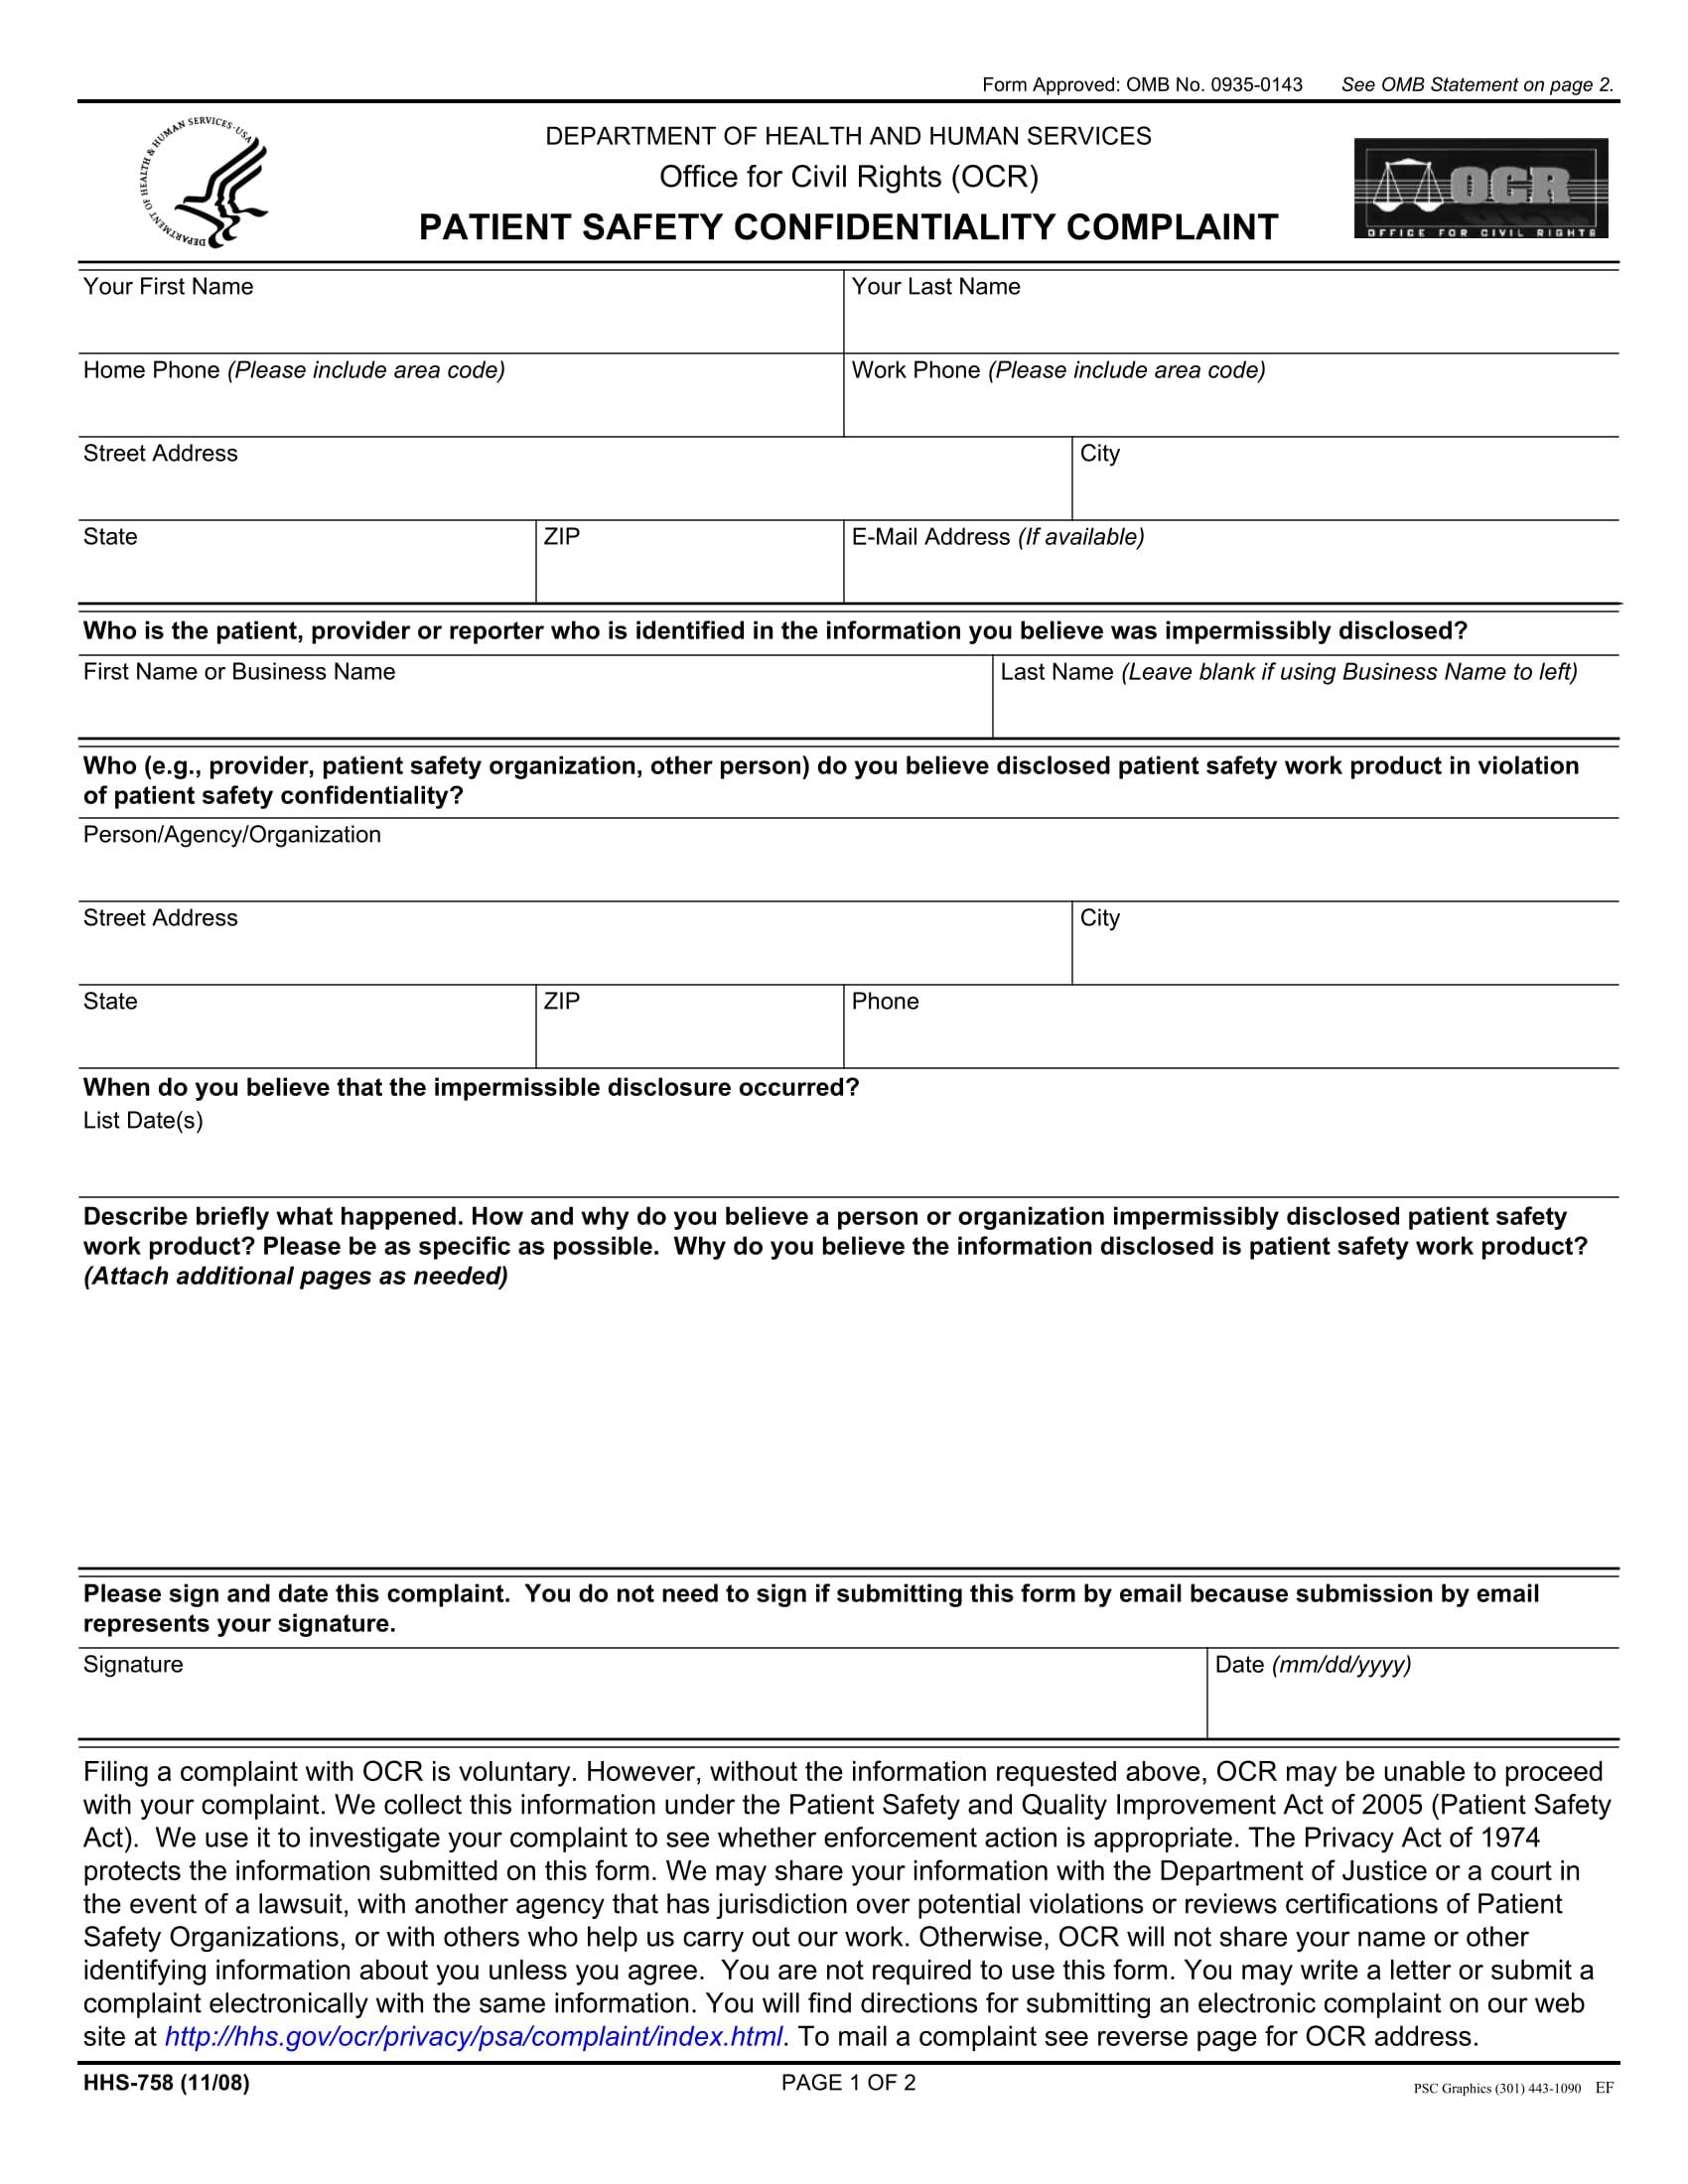 patient safety confidentiality complaint form 1